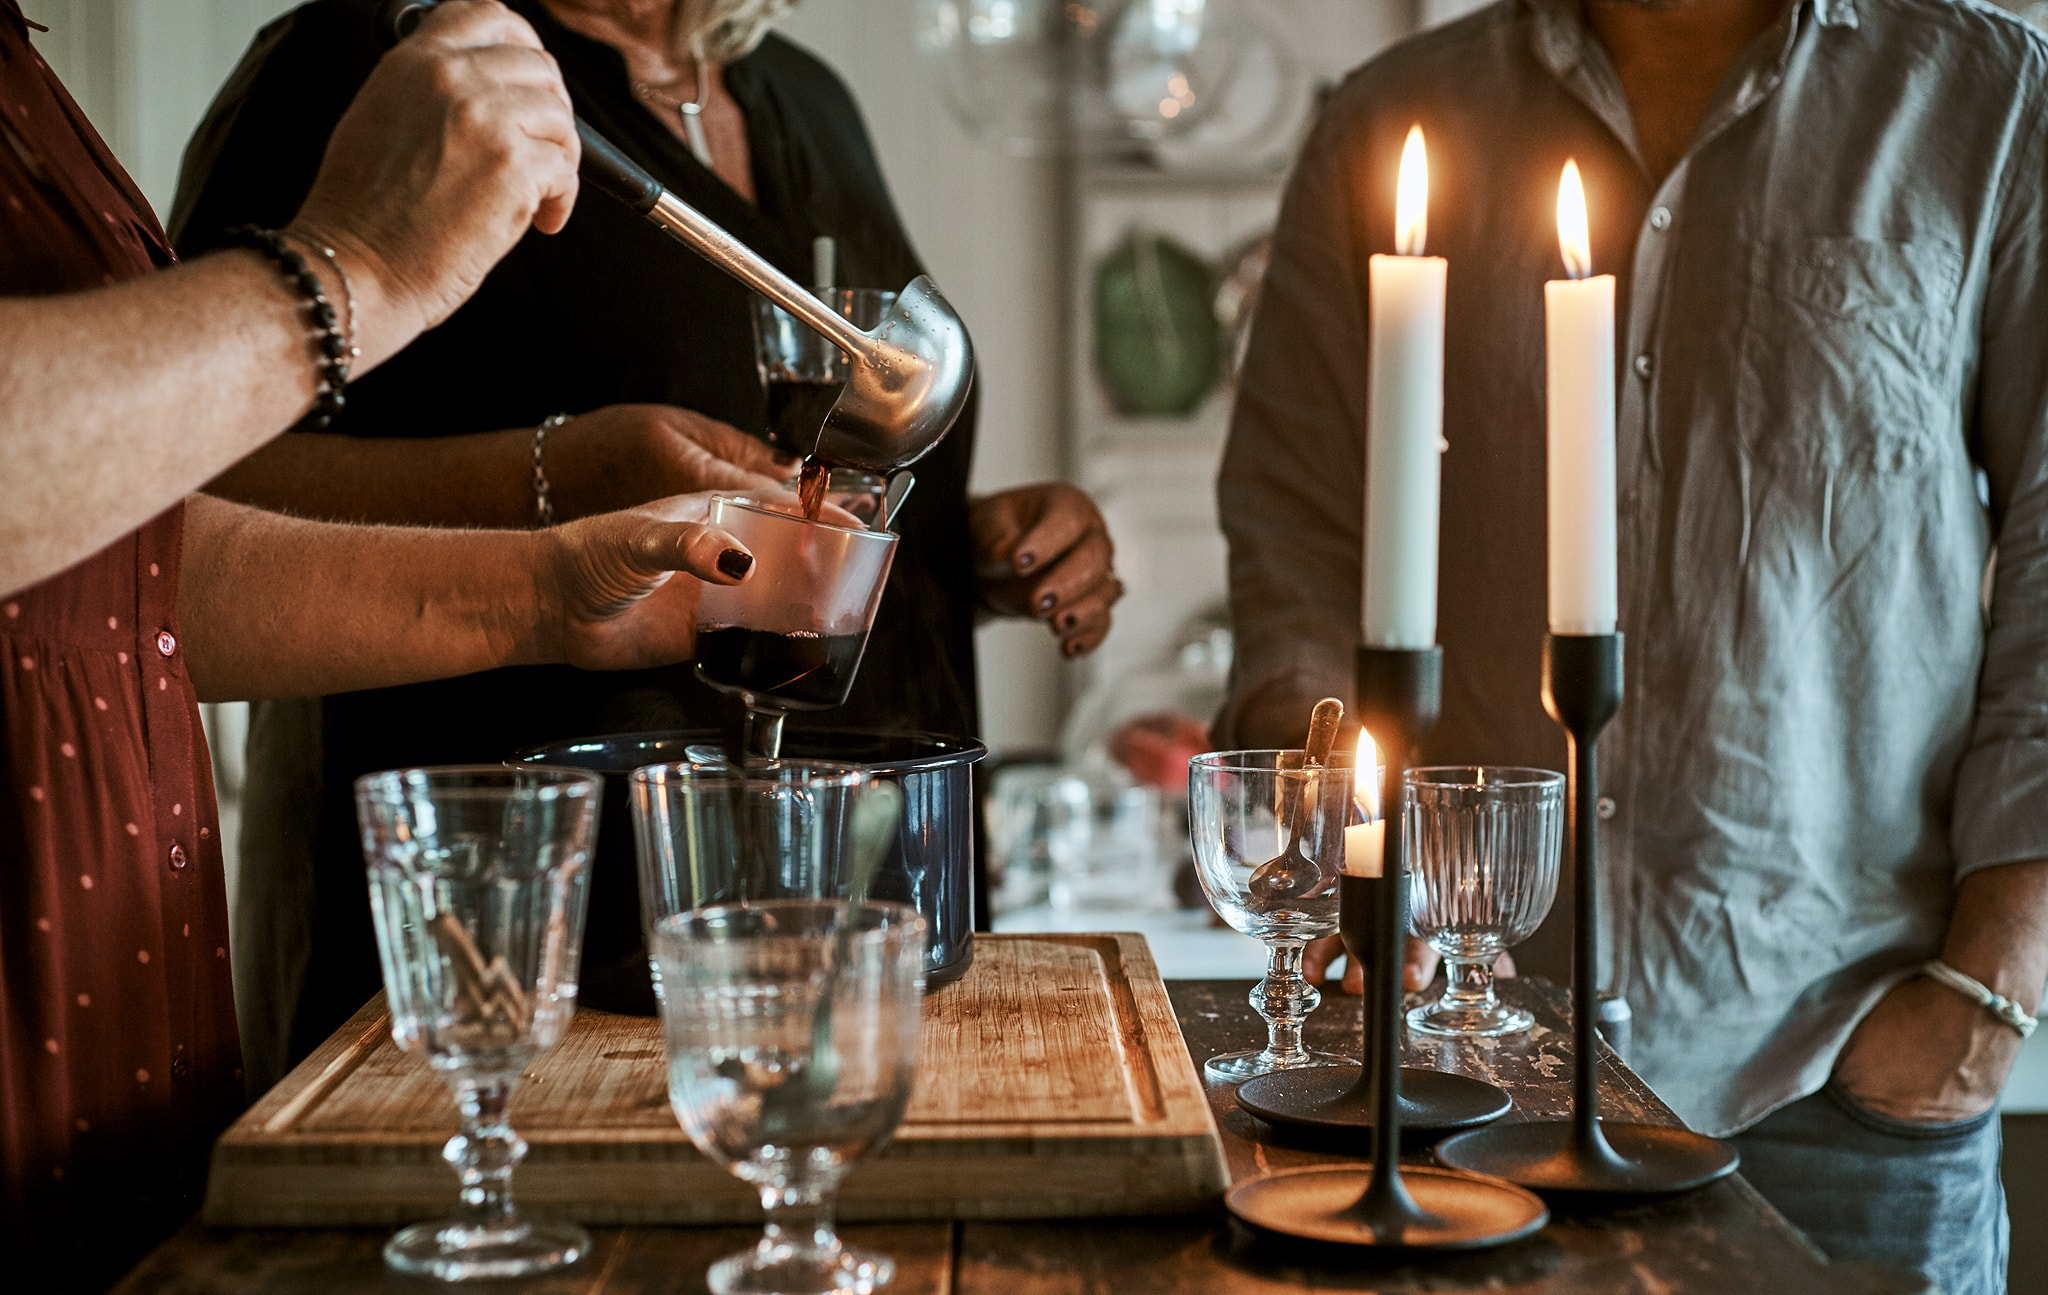 Kunjungan rumah: mengadakan pesta rumah yang menyenangkan